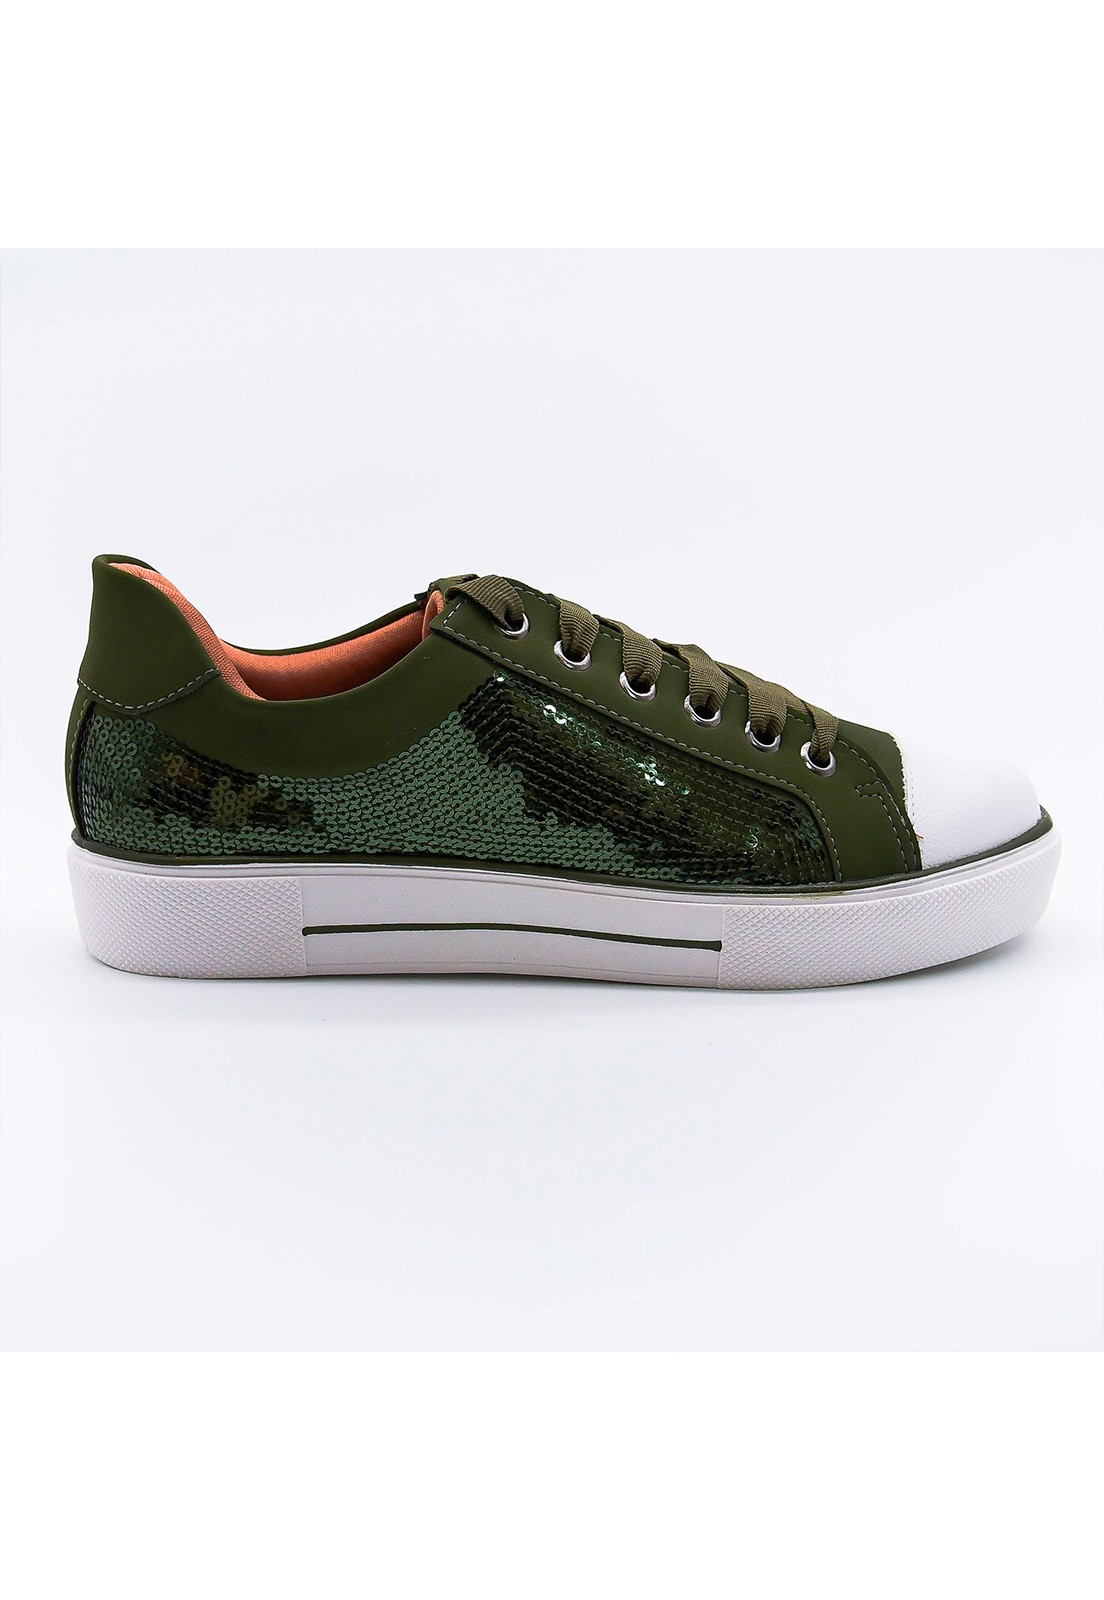 Tênis verde militar Bendito Sapato